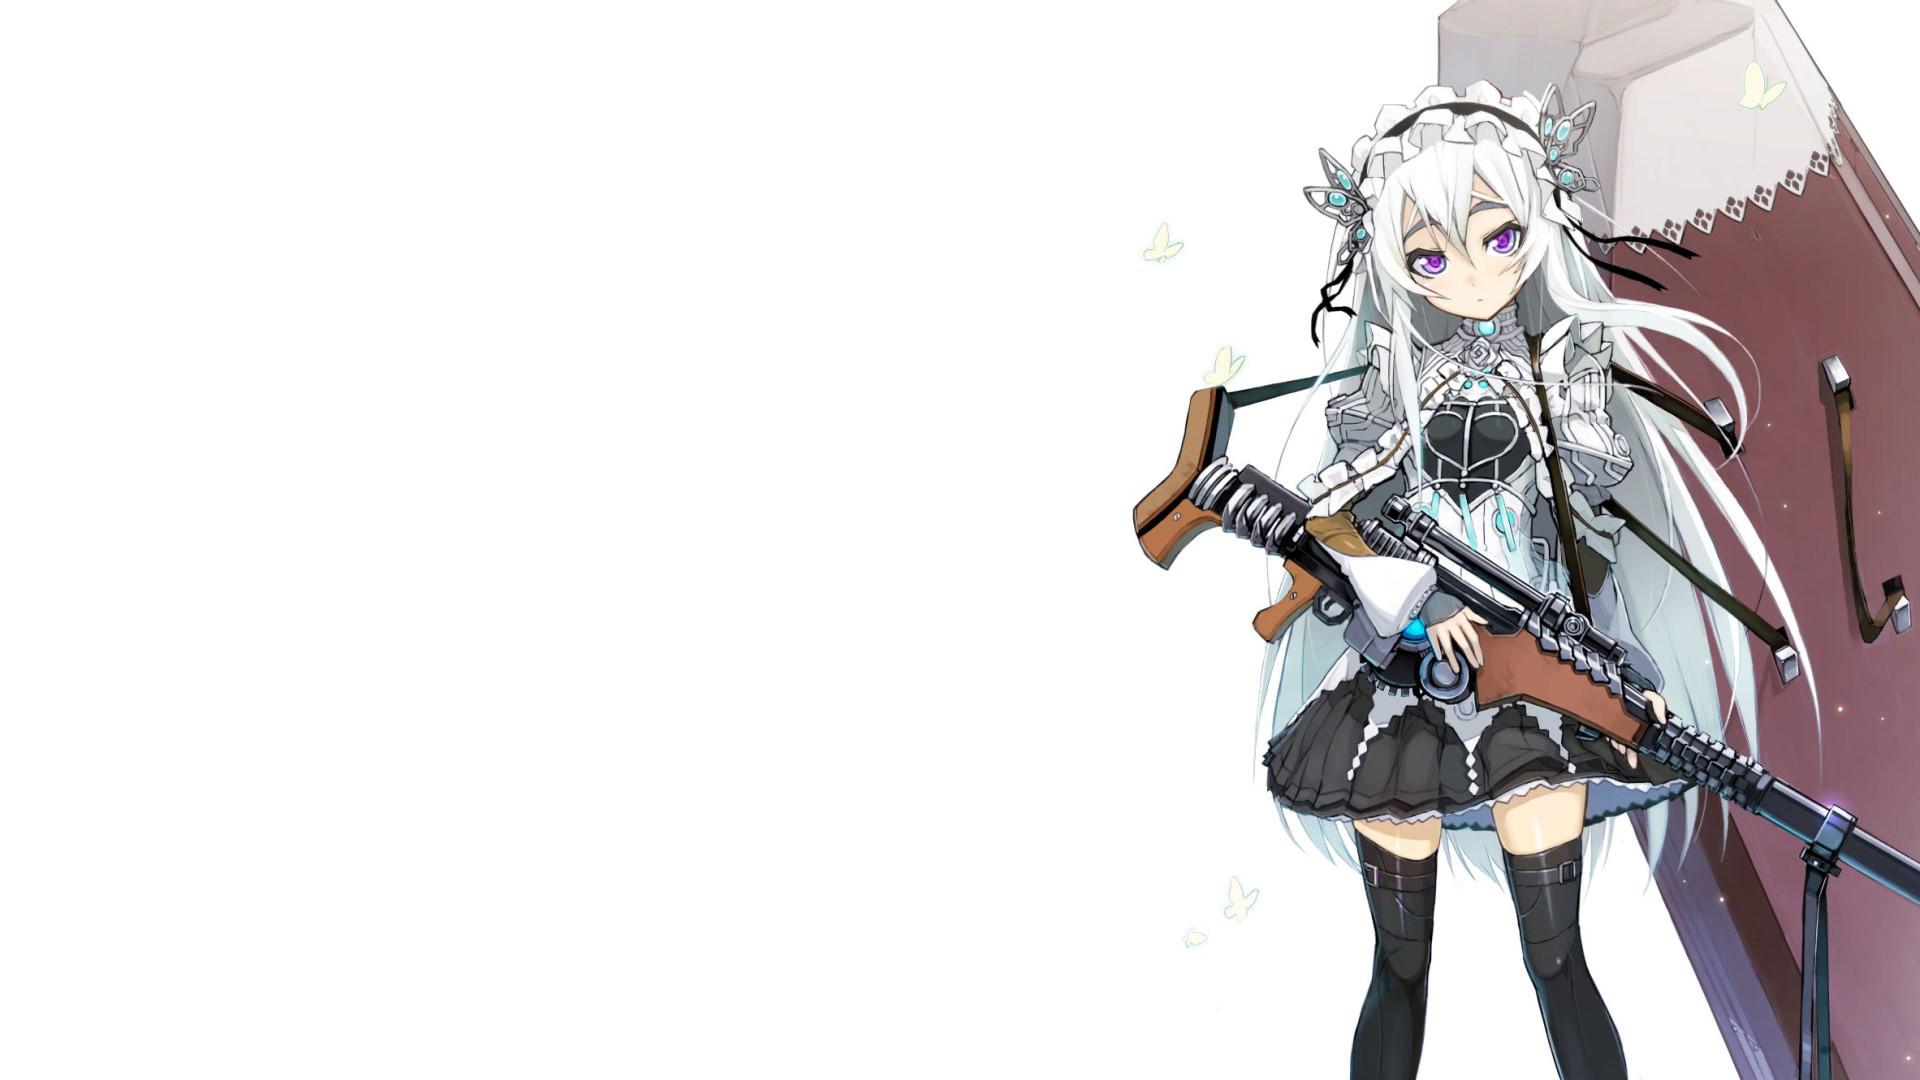 Wallpaper Hd Animes Juntos: HD Anime Wallpapers 1080p (72+ Images